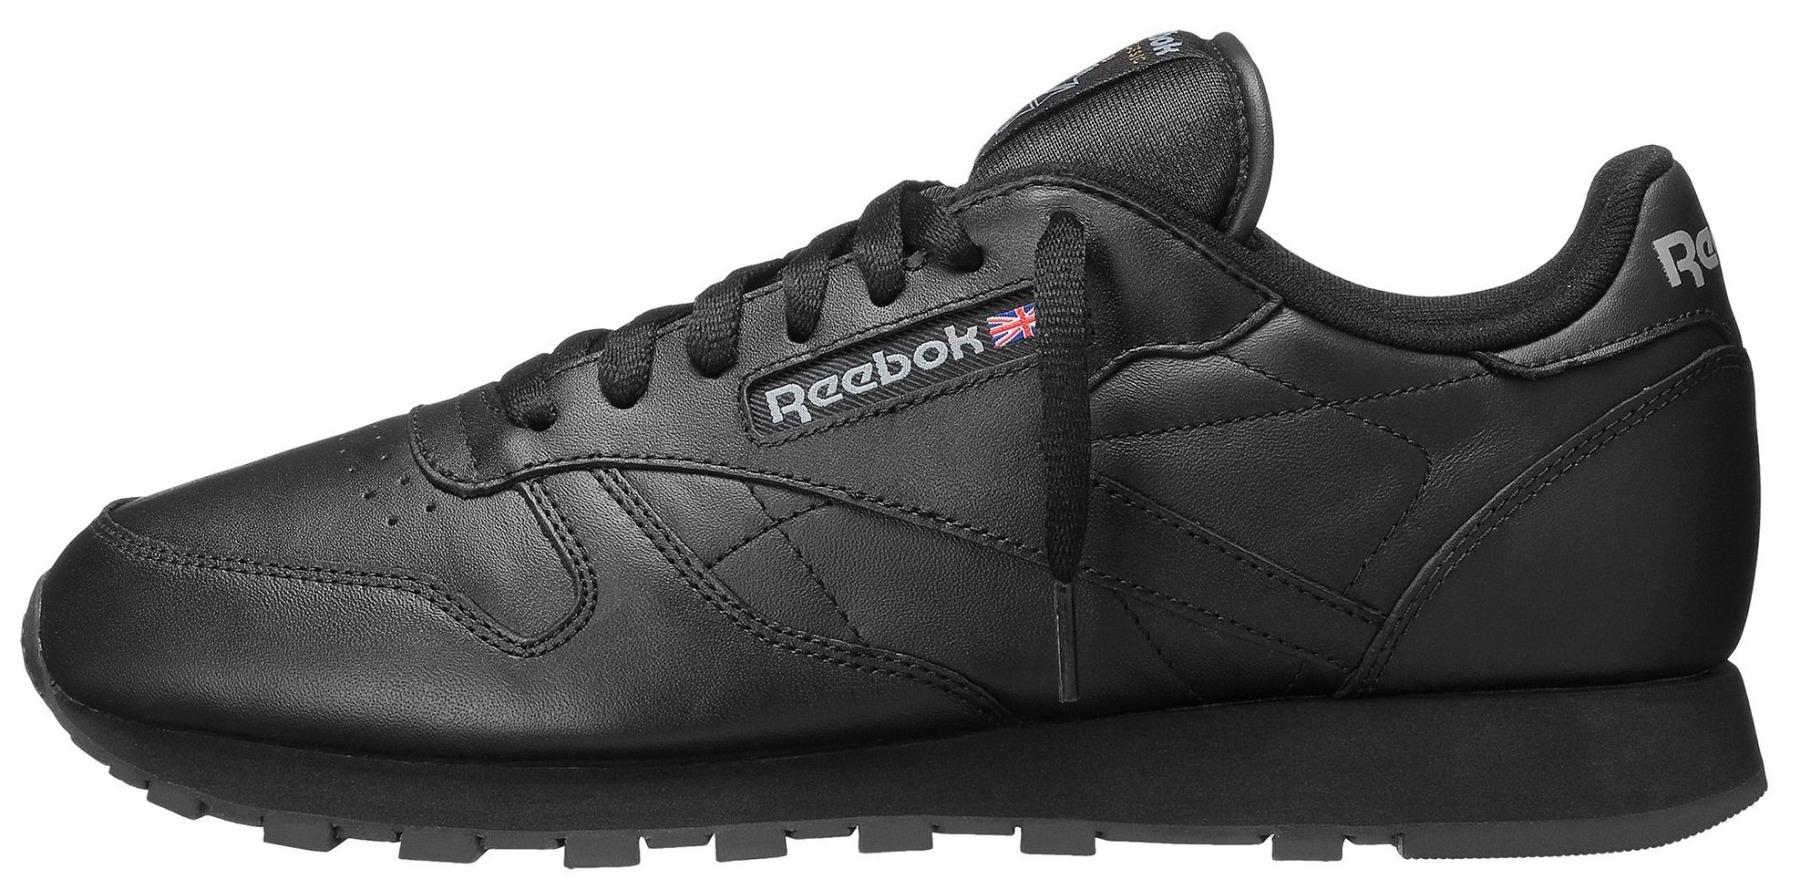 Reebok Classic — купить кроссовки Рибок Классик мужские, цена    Brooklynstore 30660e55ecd